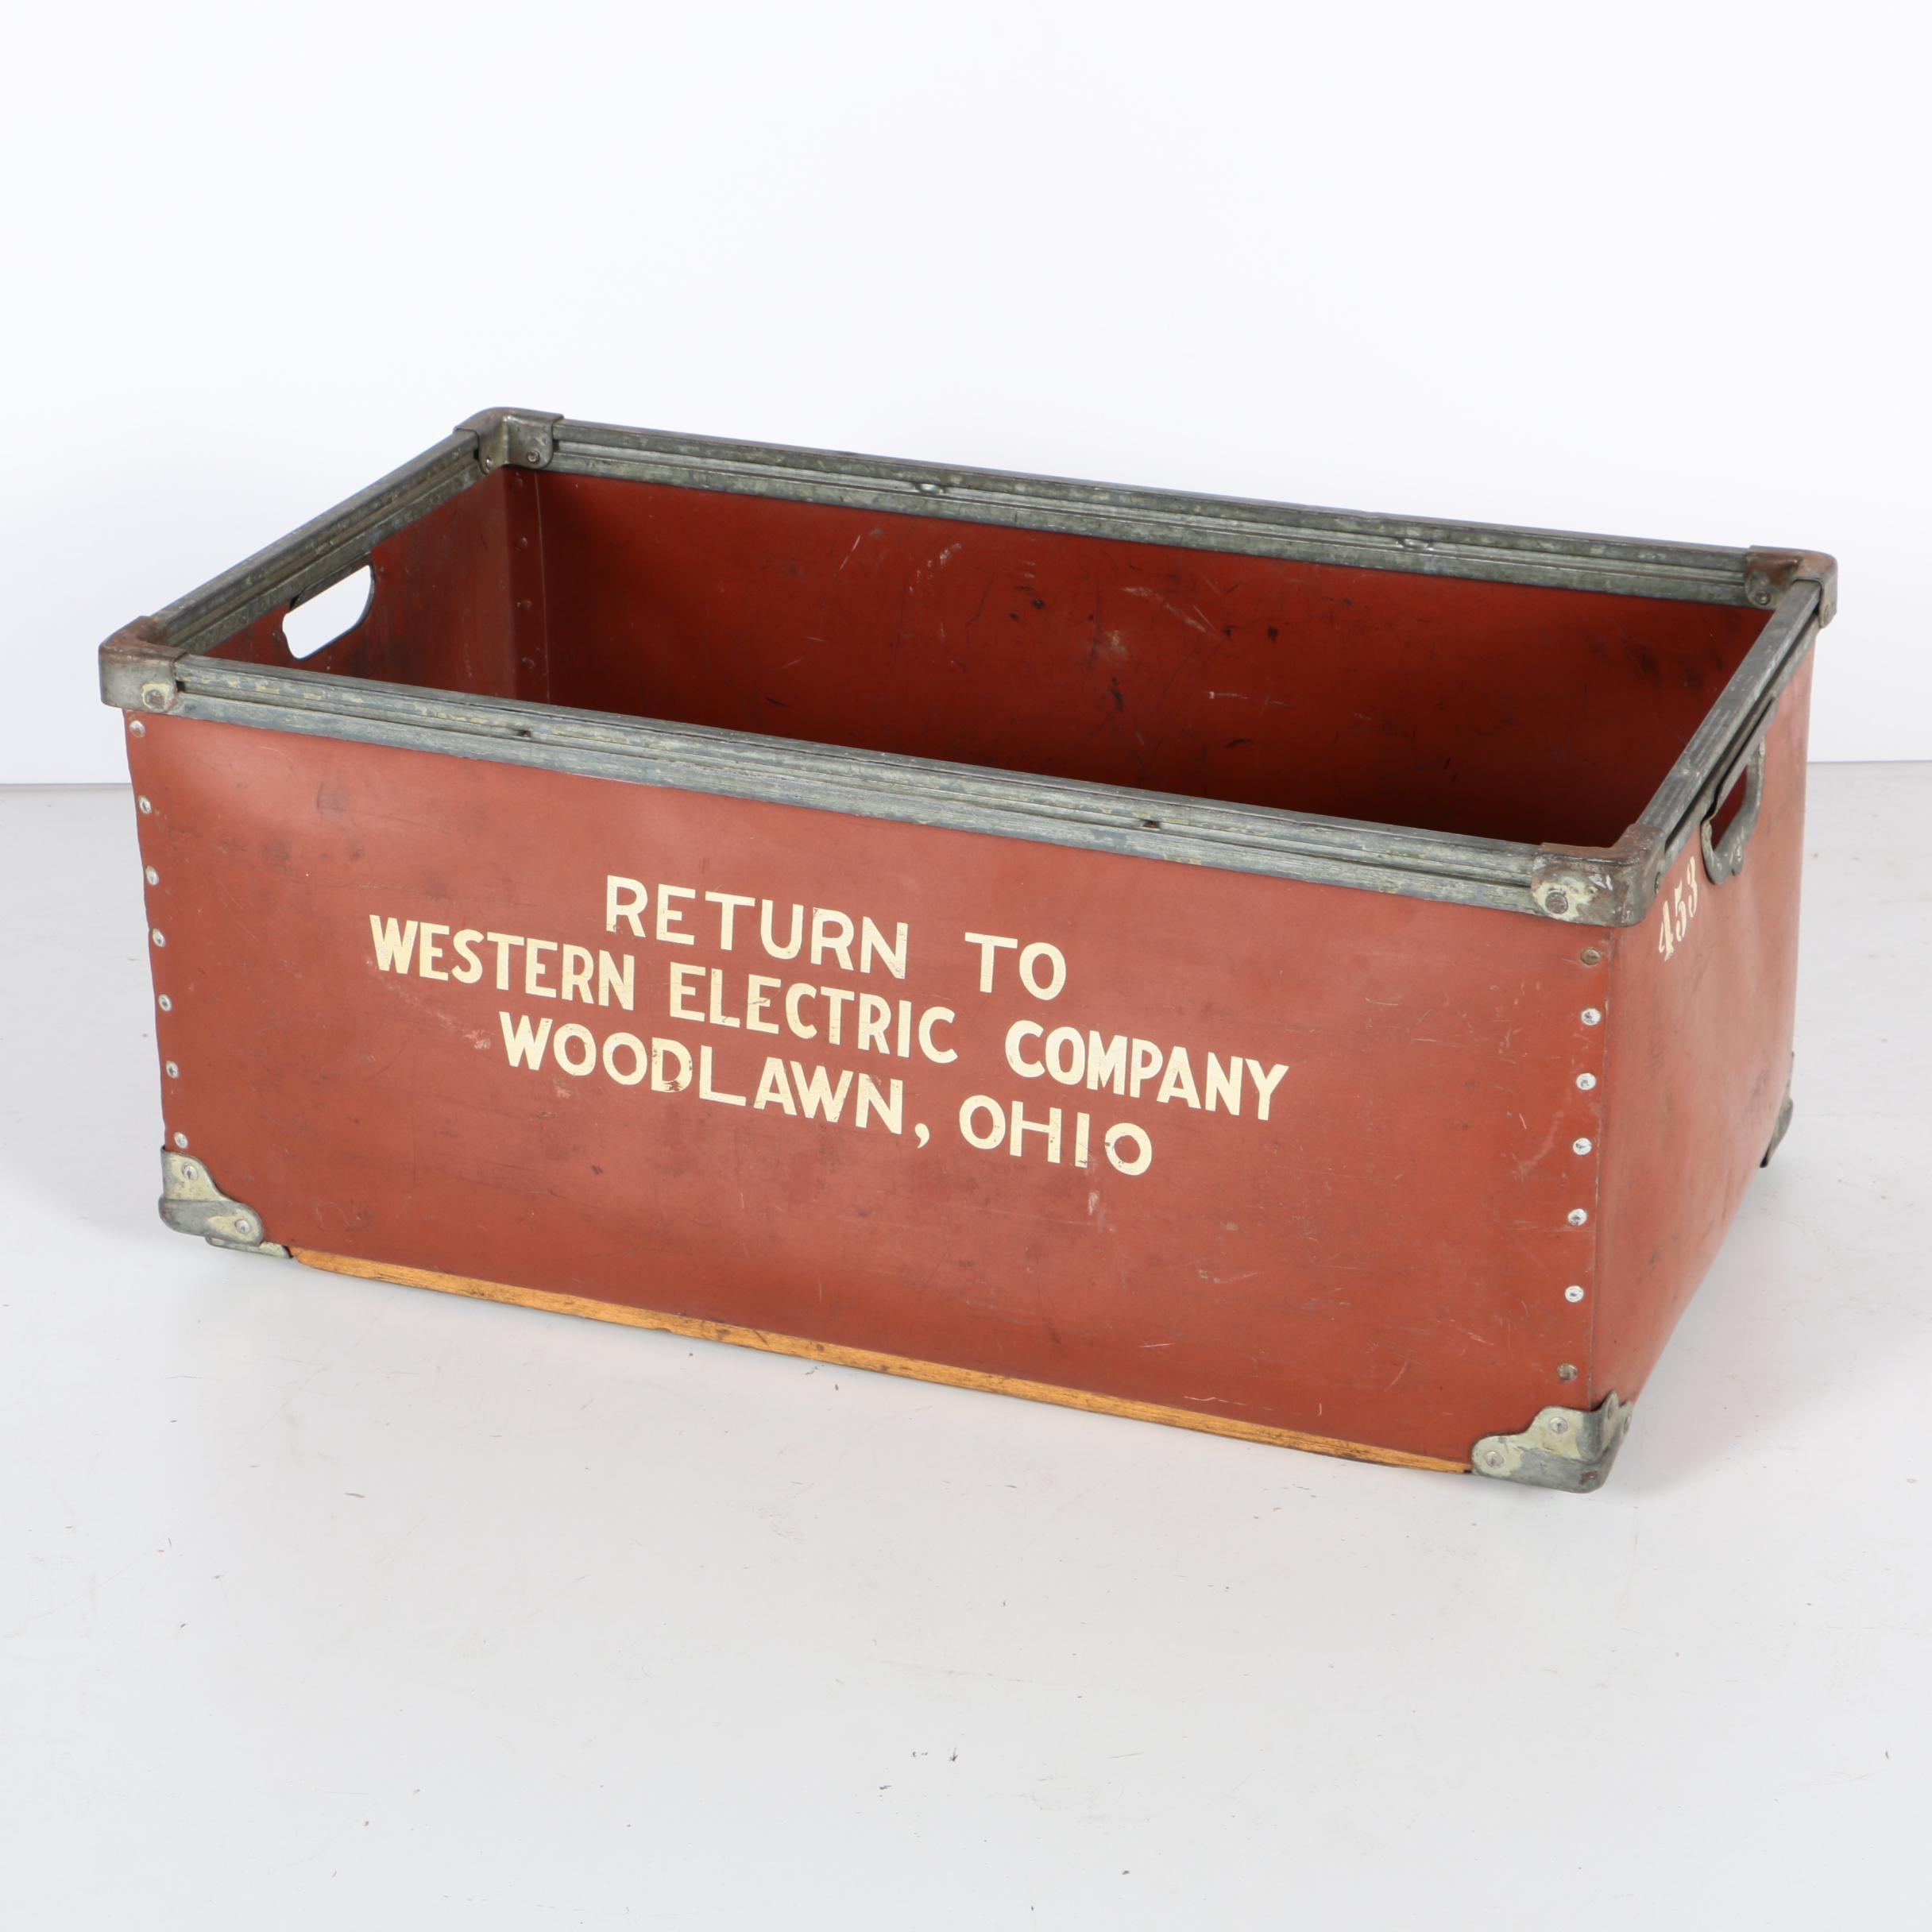 Vintage Western Electric Company Bin